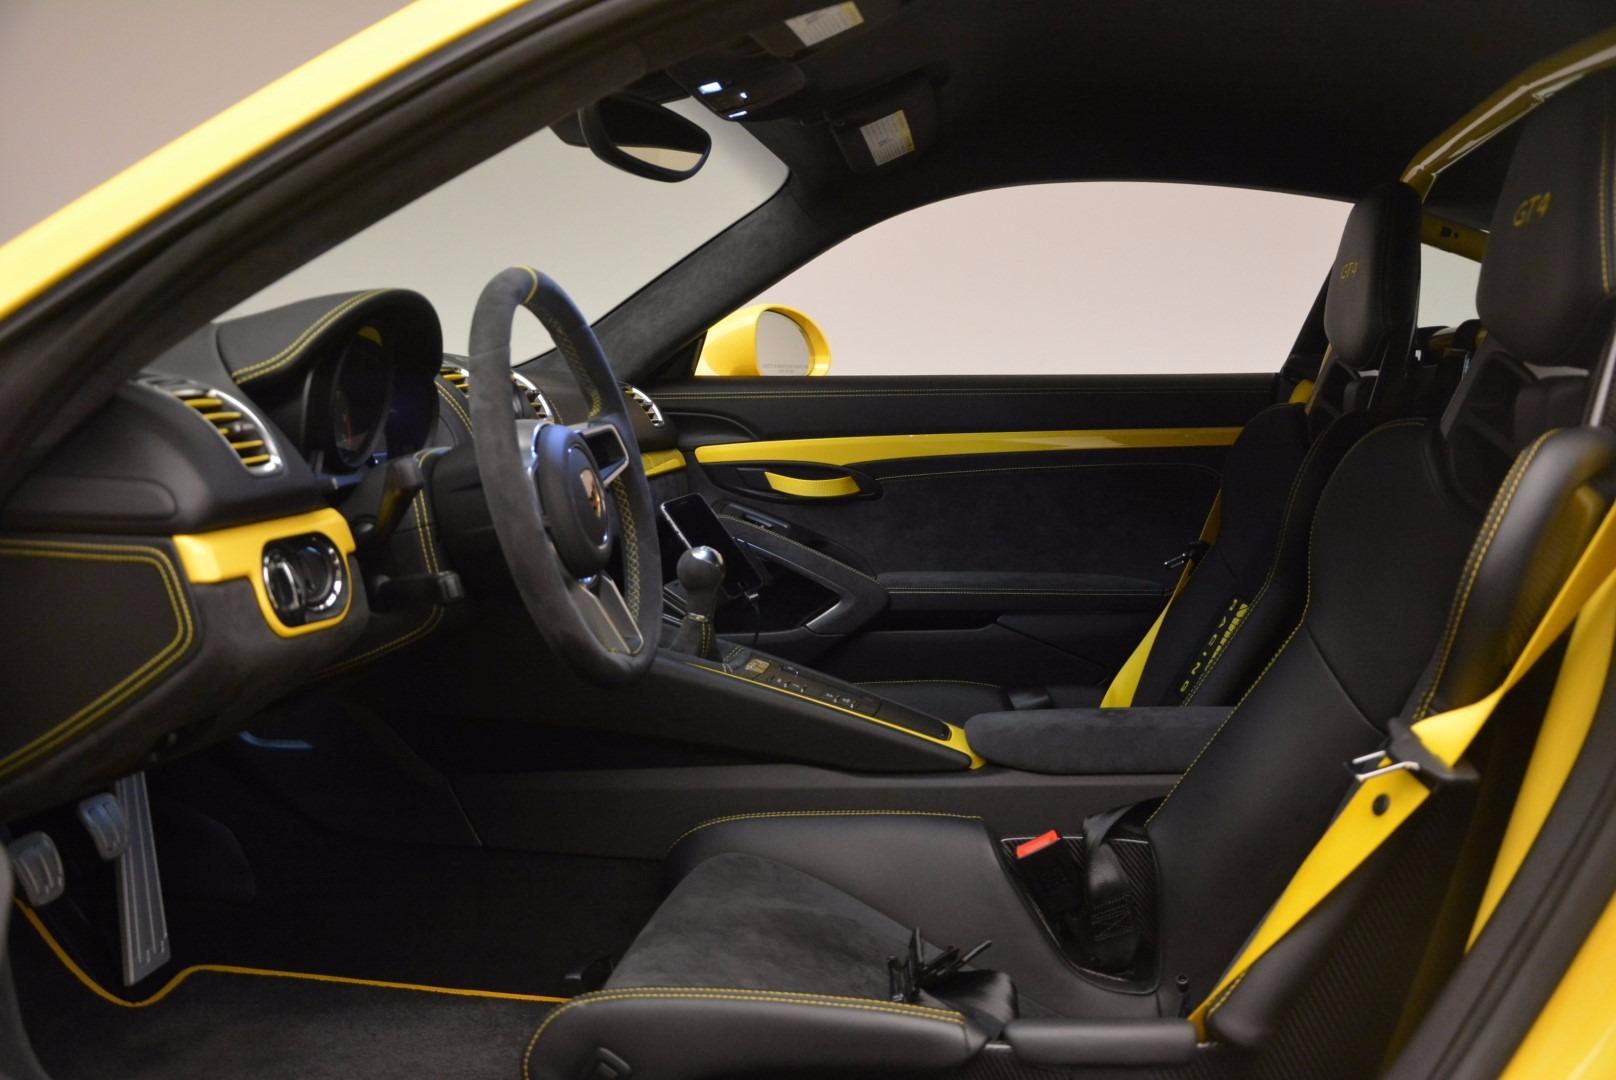 Used 2016 Porsche Cayman GT4 For Sale In Westport, CT 897_p14